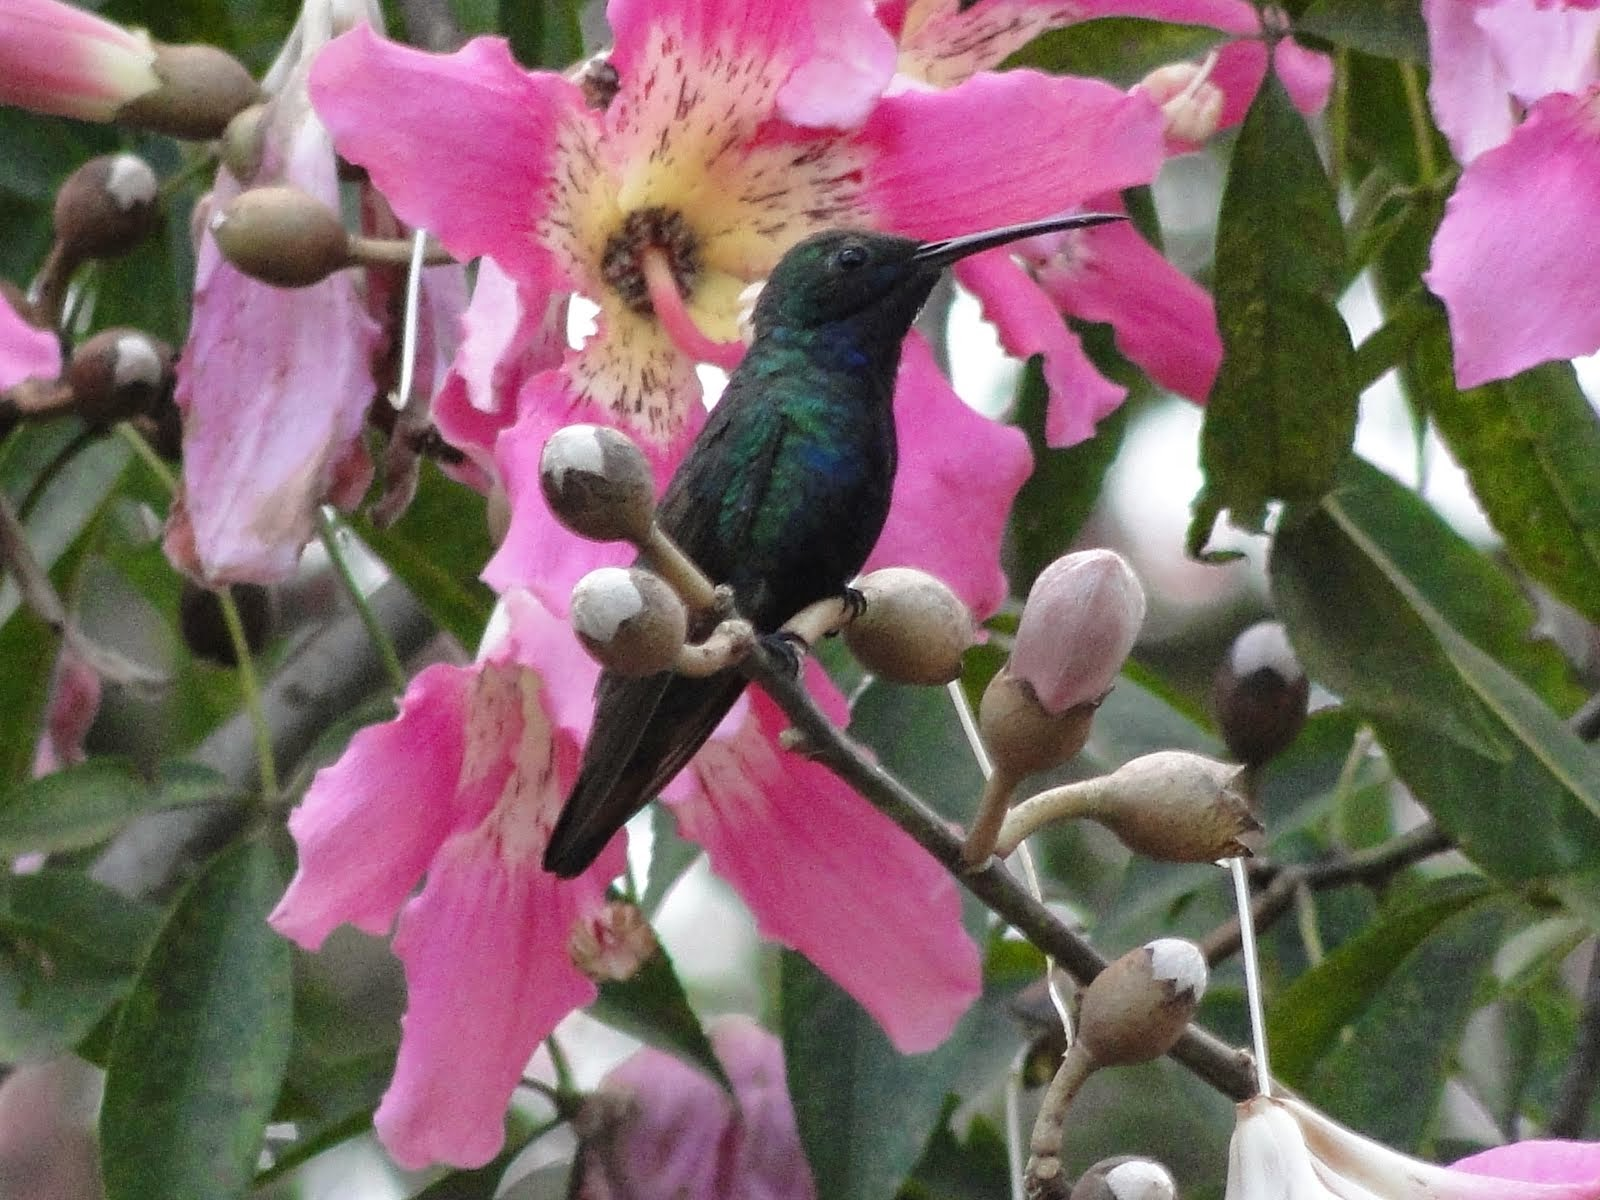 Beija-flores de Arceburgo - Numero 2